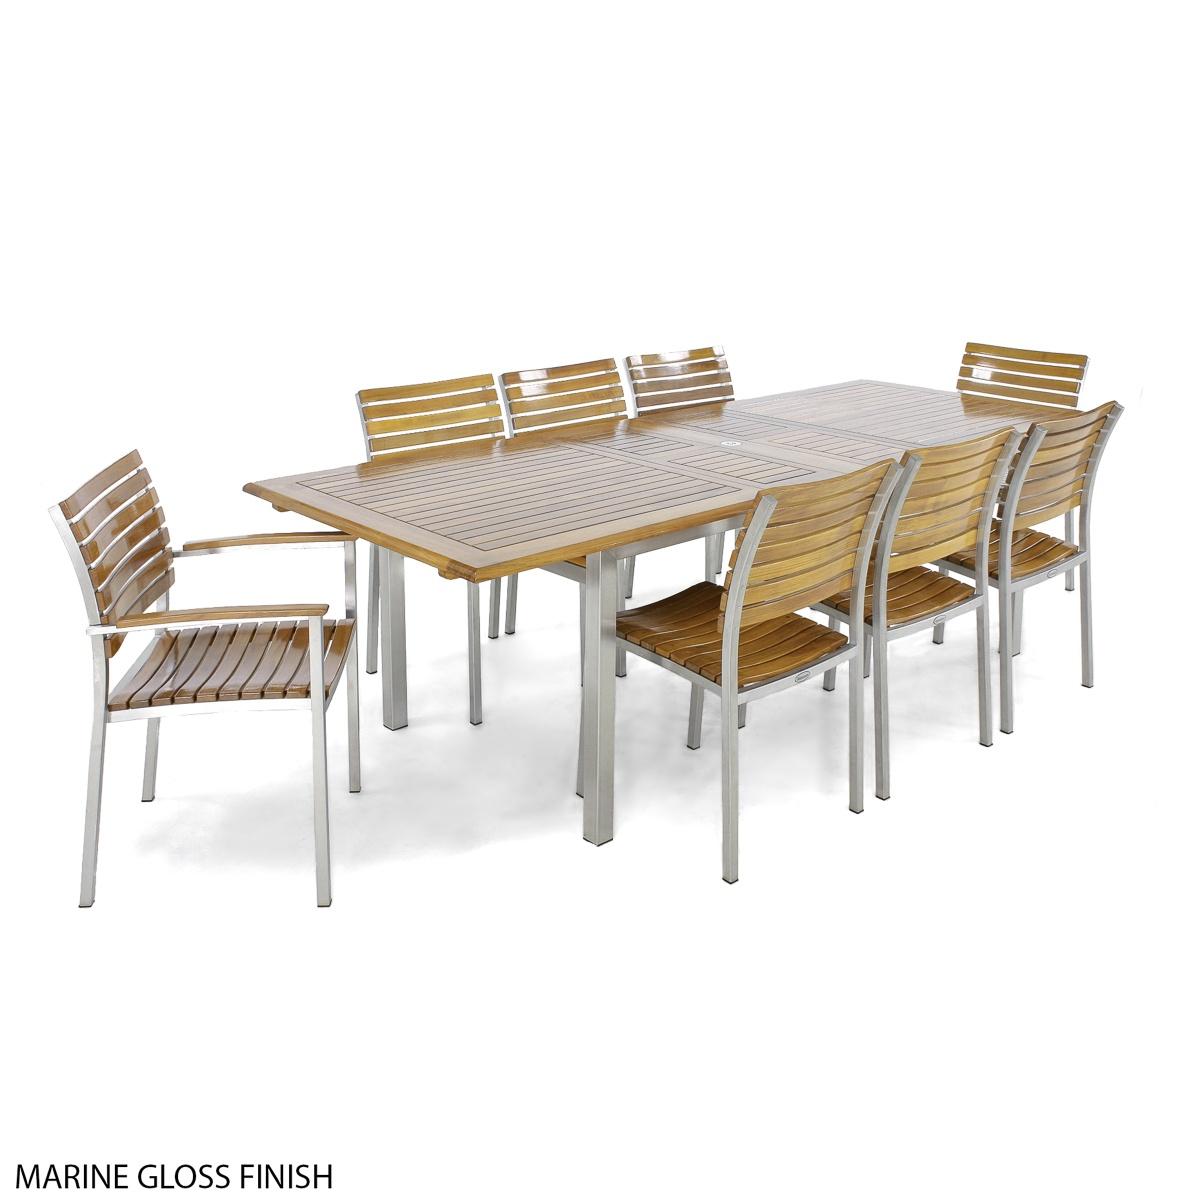 Teak patio furniture set westminster teak outdoor furniture for Teak patio furniture